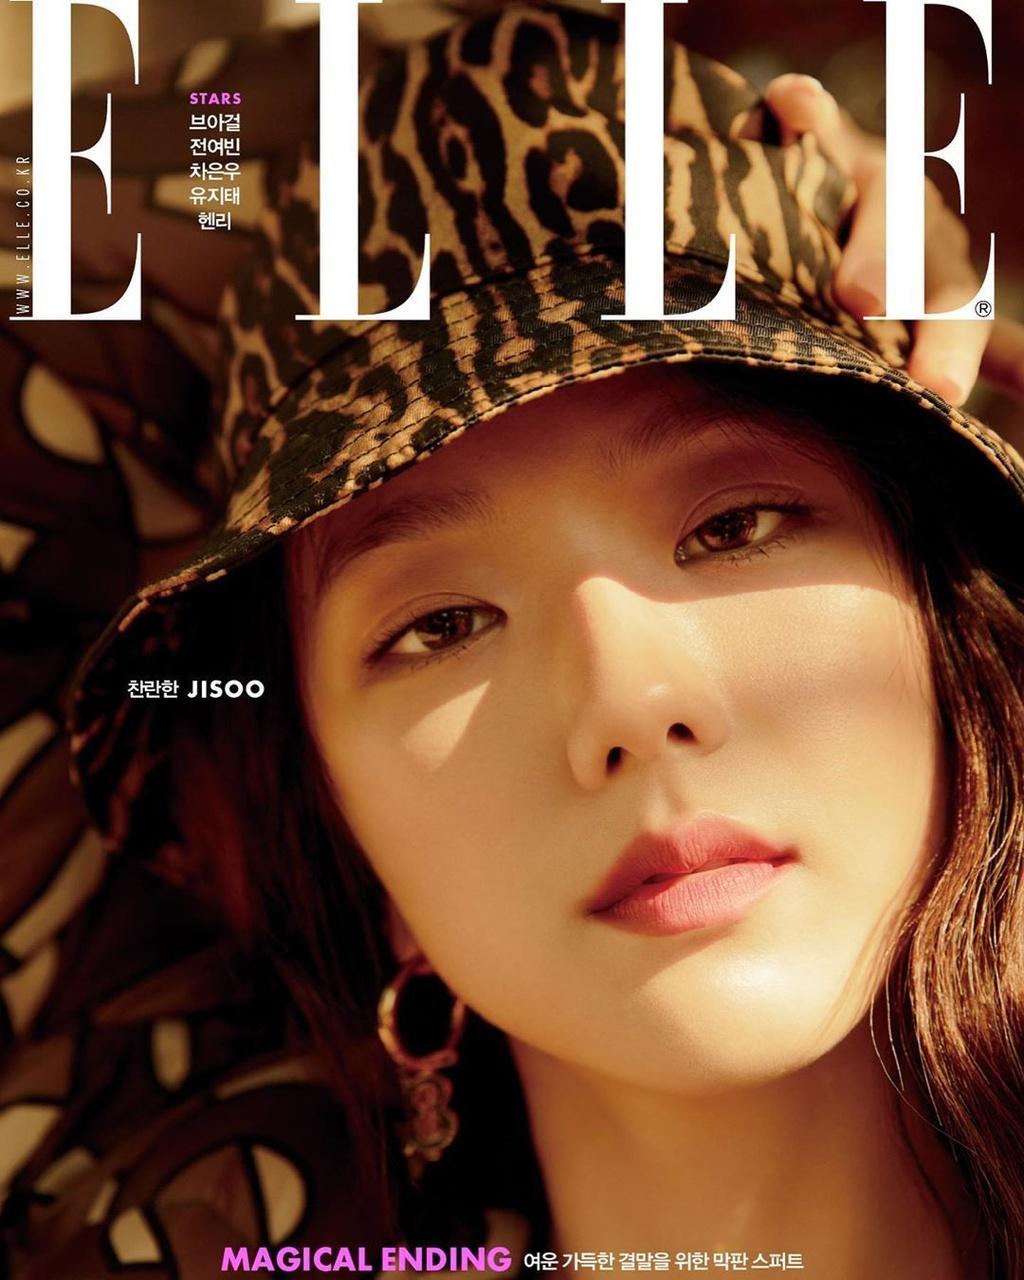 Bo anh khien Ji Soo (Black Pink) duoc vi dep nhu hoa hau hinh anh 7 1_BLACKPINK_Jisoo_ELLE_Korea_Magazine_December_2019_Issue_with_Burberry.jpg